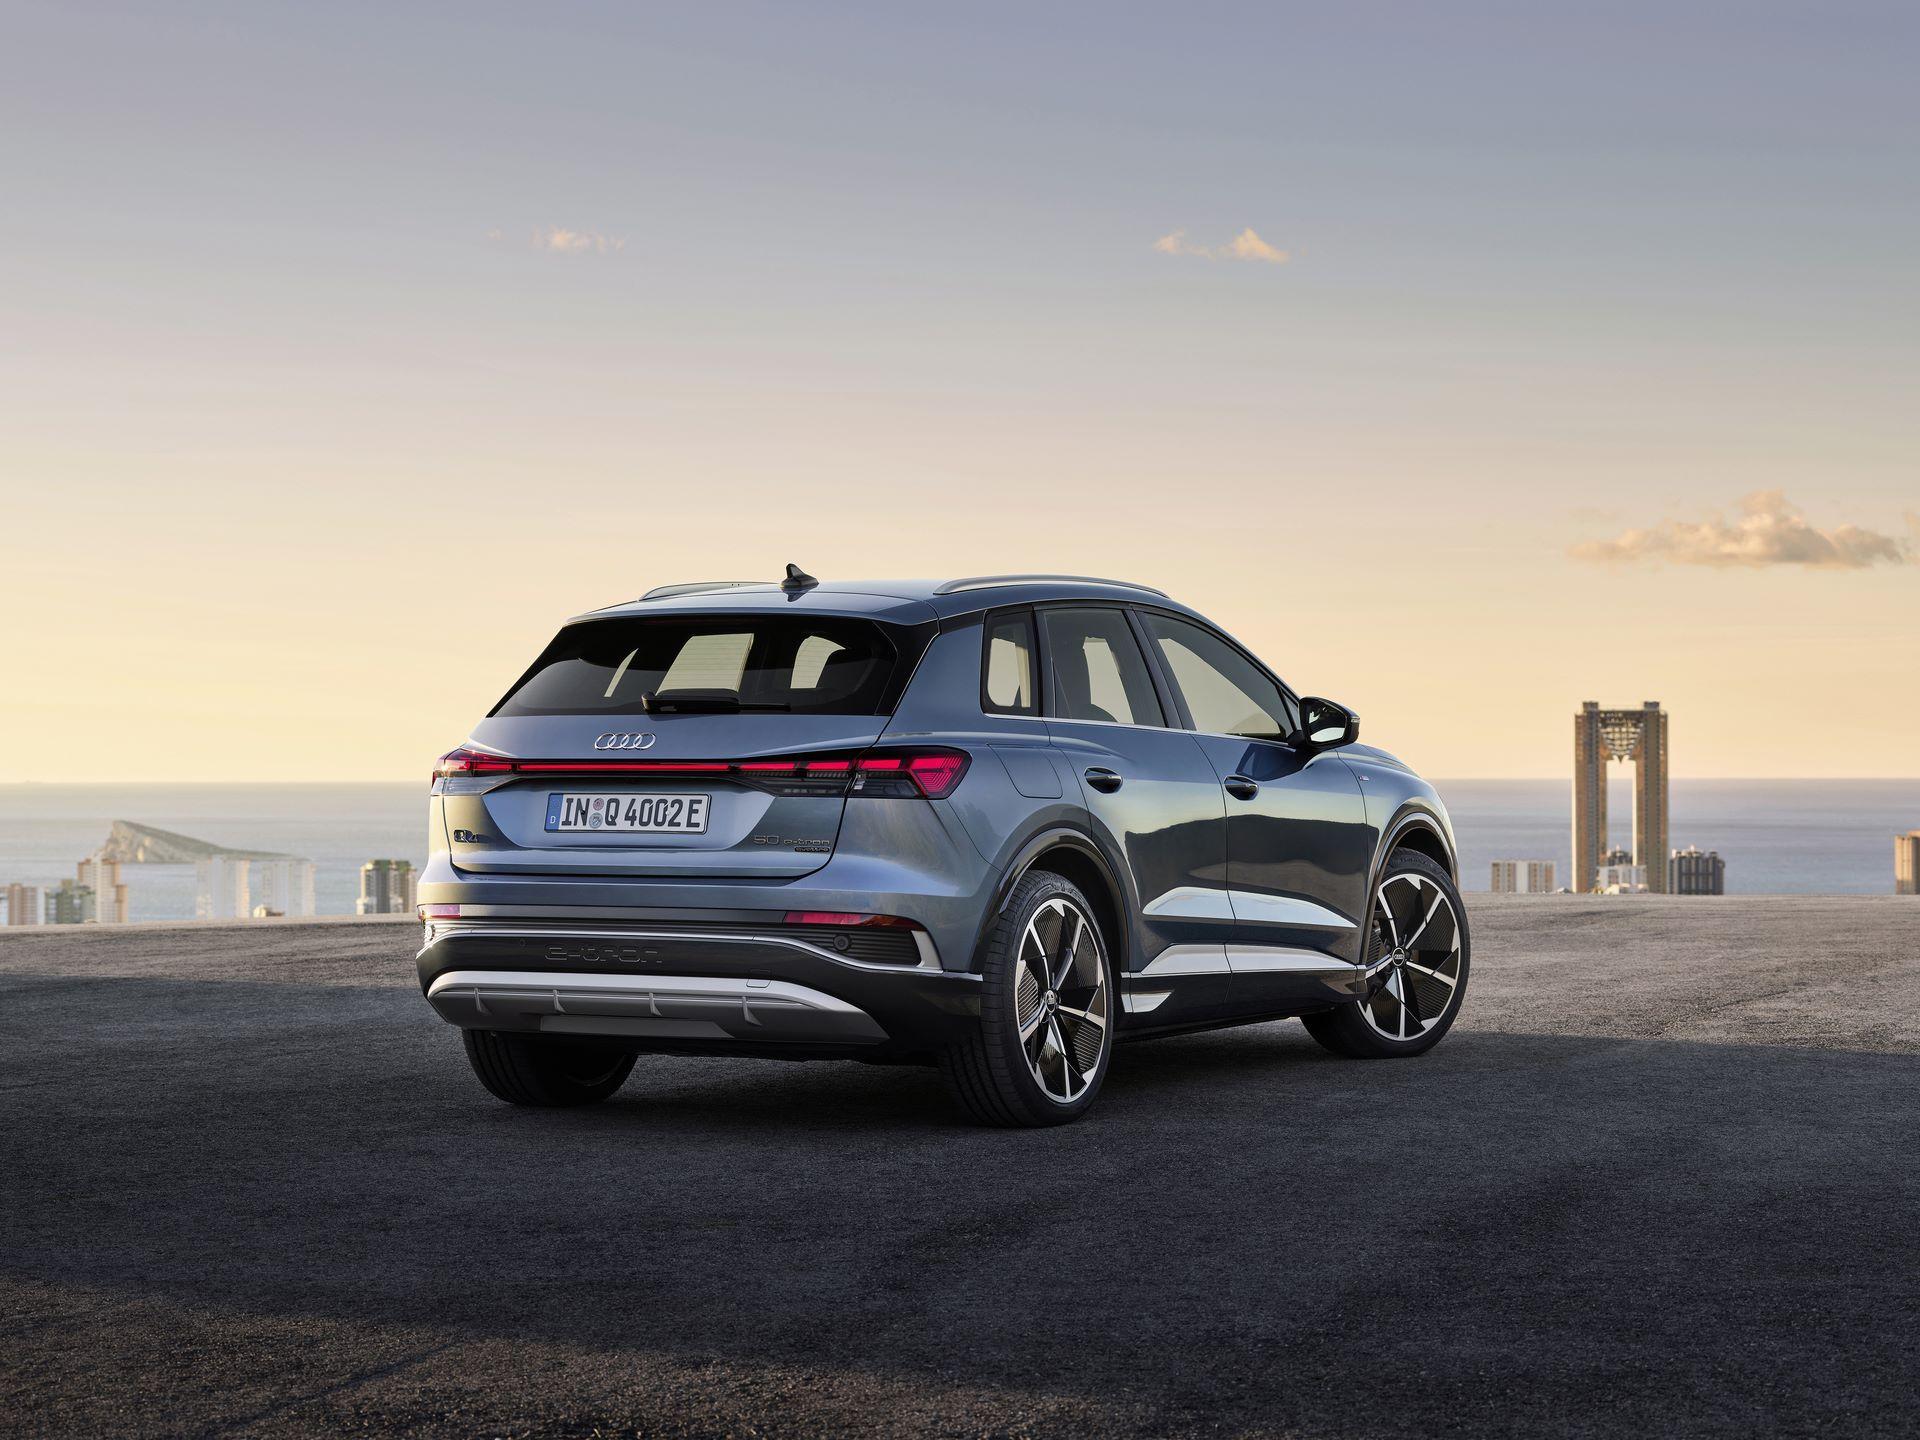 Audi-Q4-e-tron-and-Q4-e-tron-Sportback-58